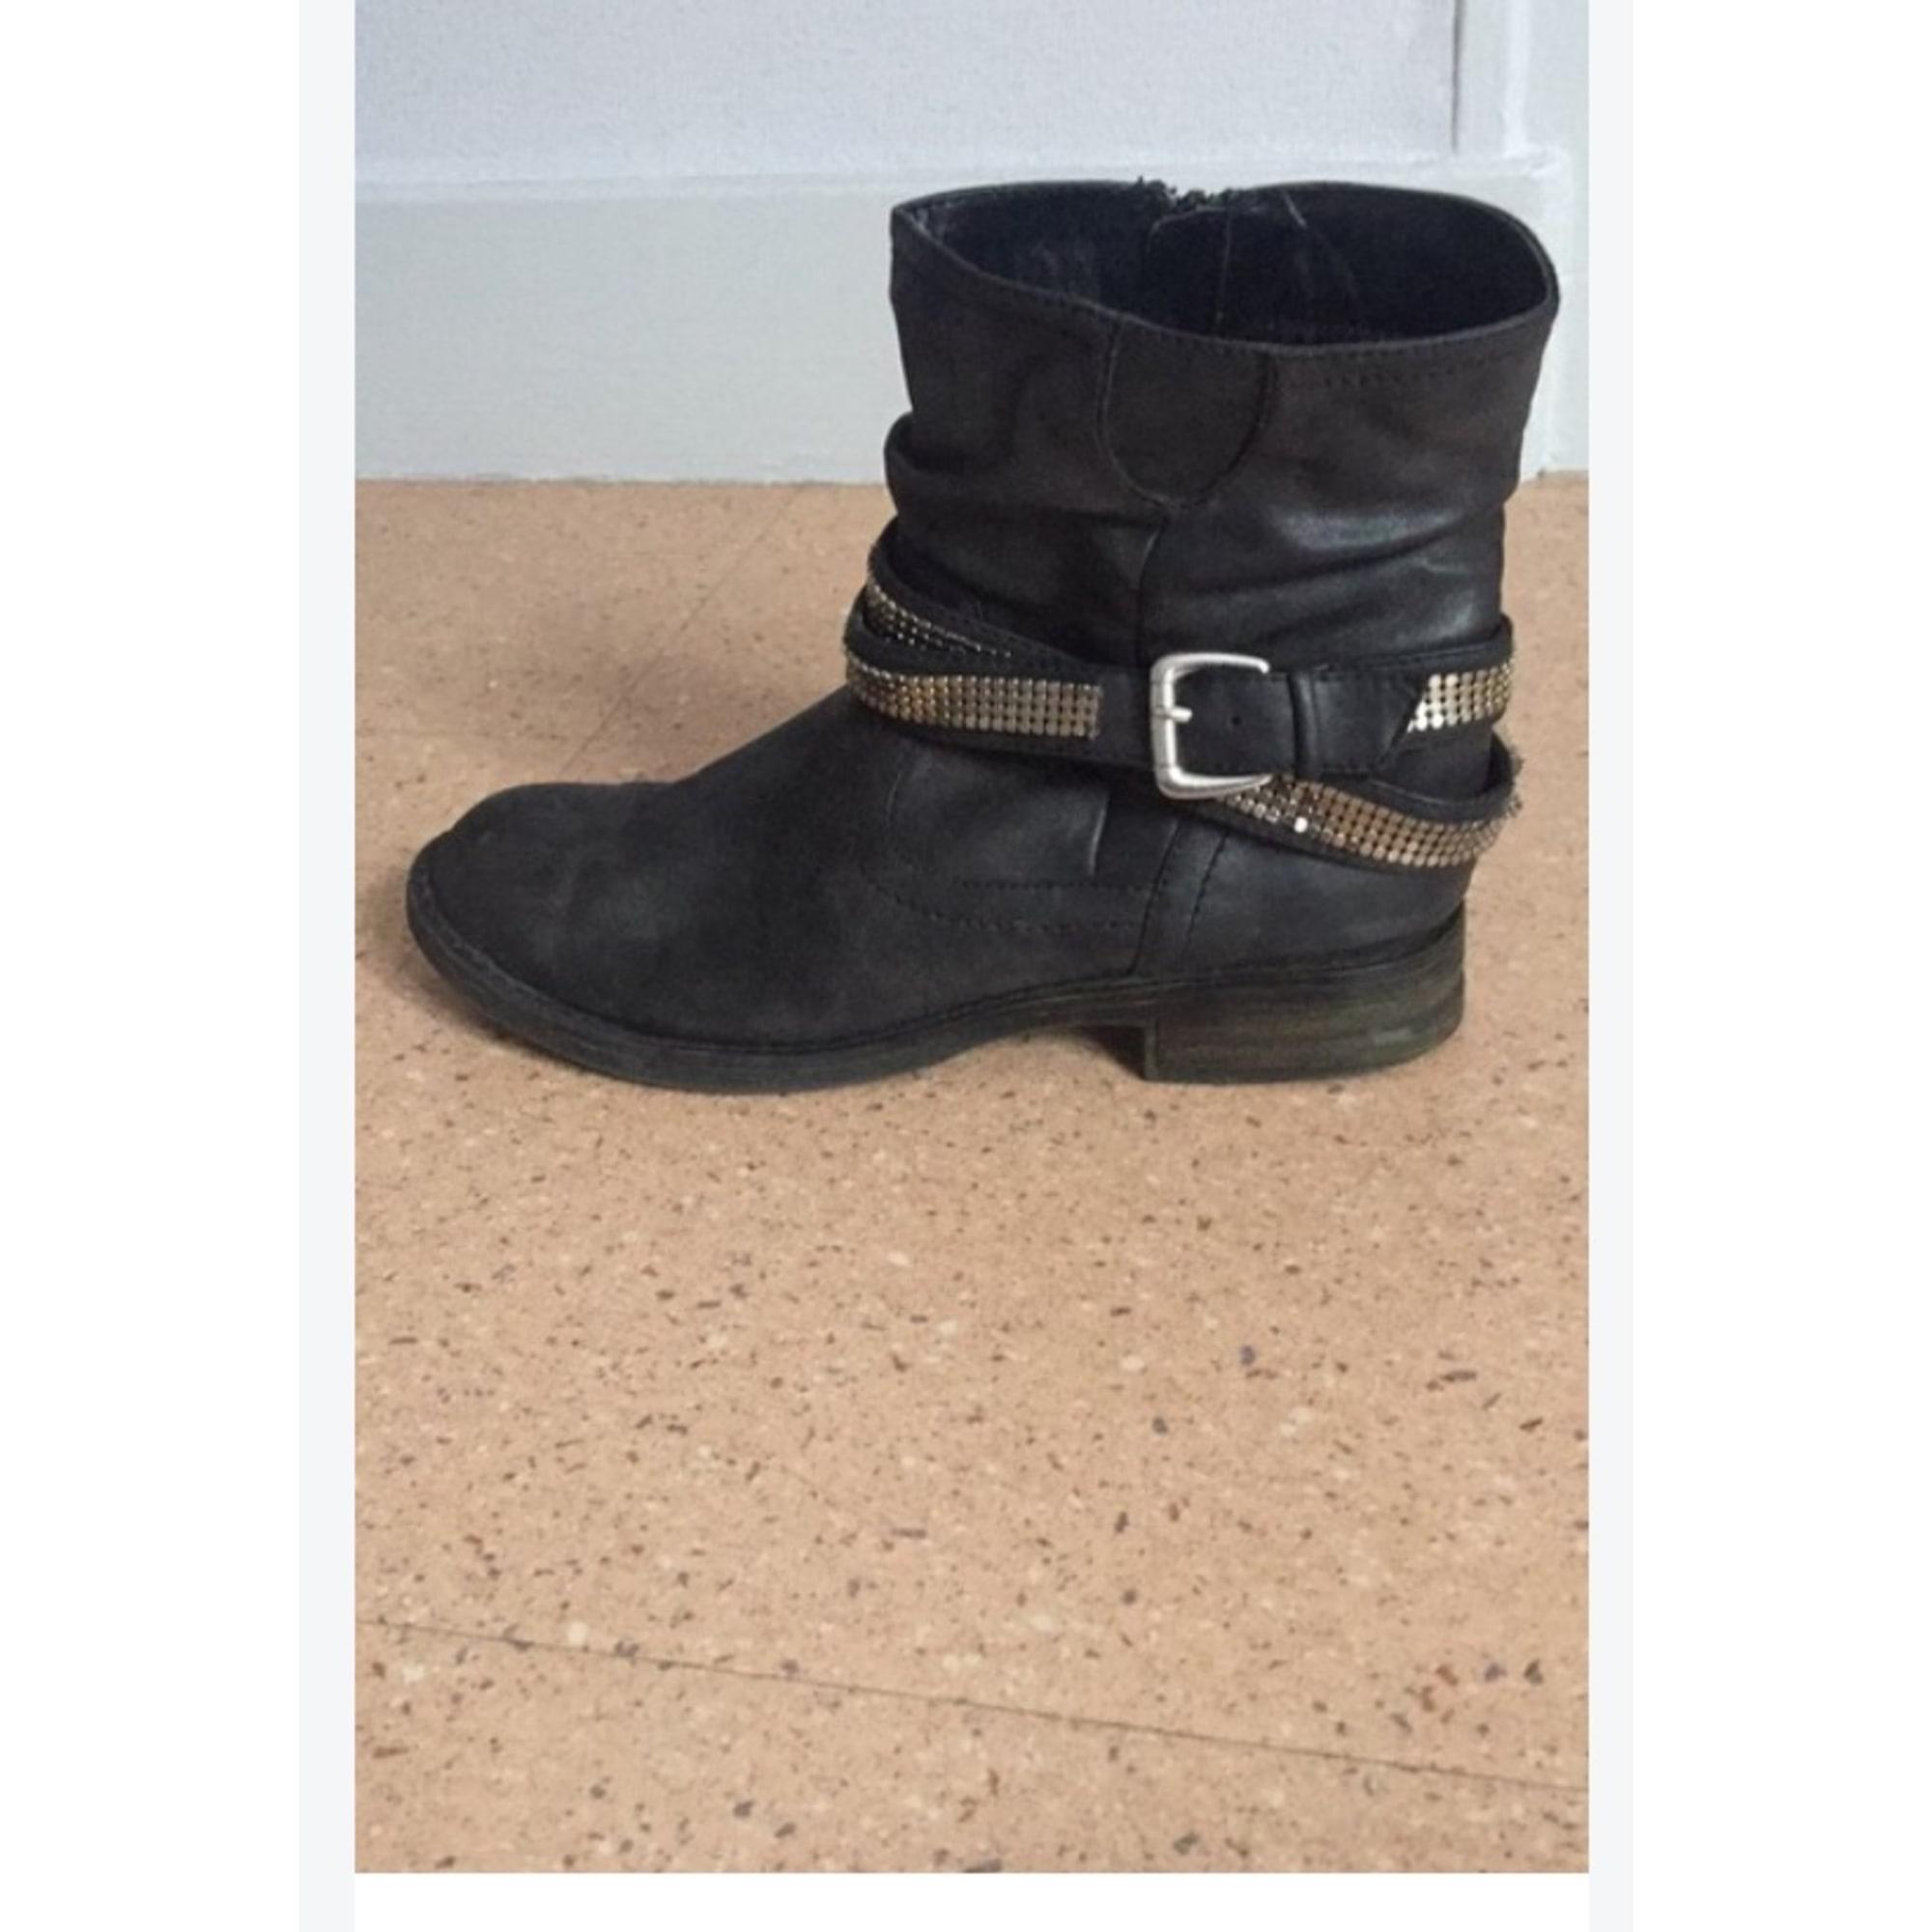 Boots Low Gémo Bottinesamp; 7743638 37 Noir Plates CoQdrxBWEe